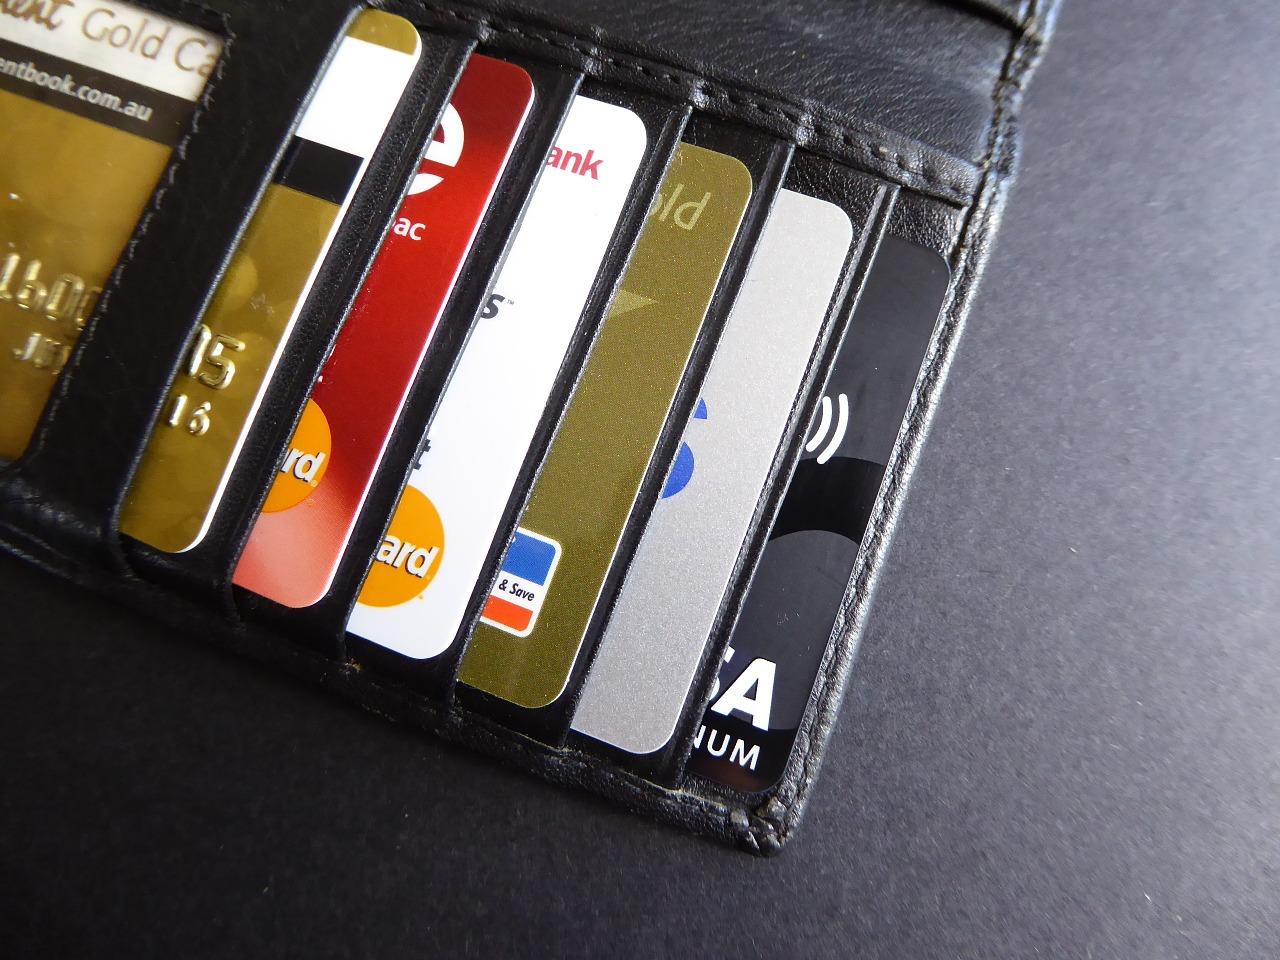 tarjetas, crédito, robo